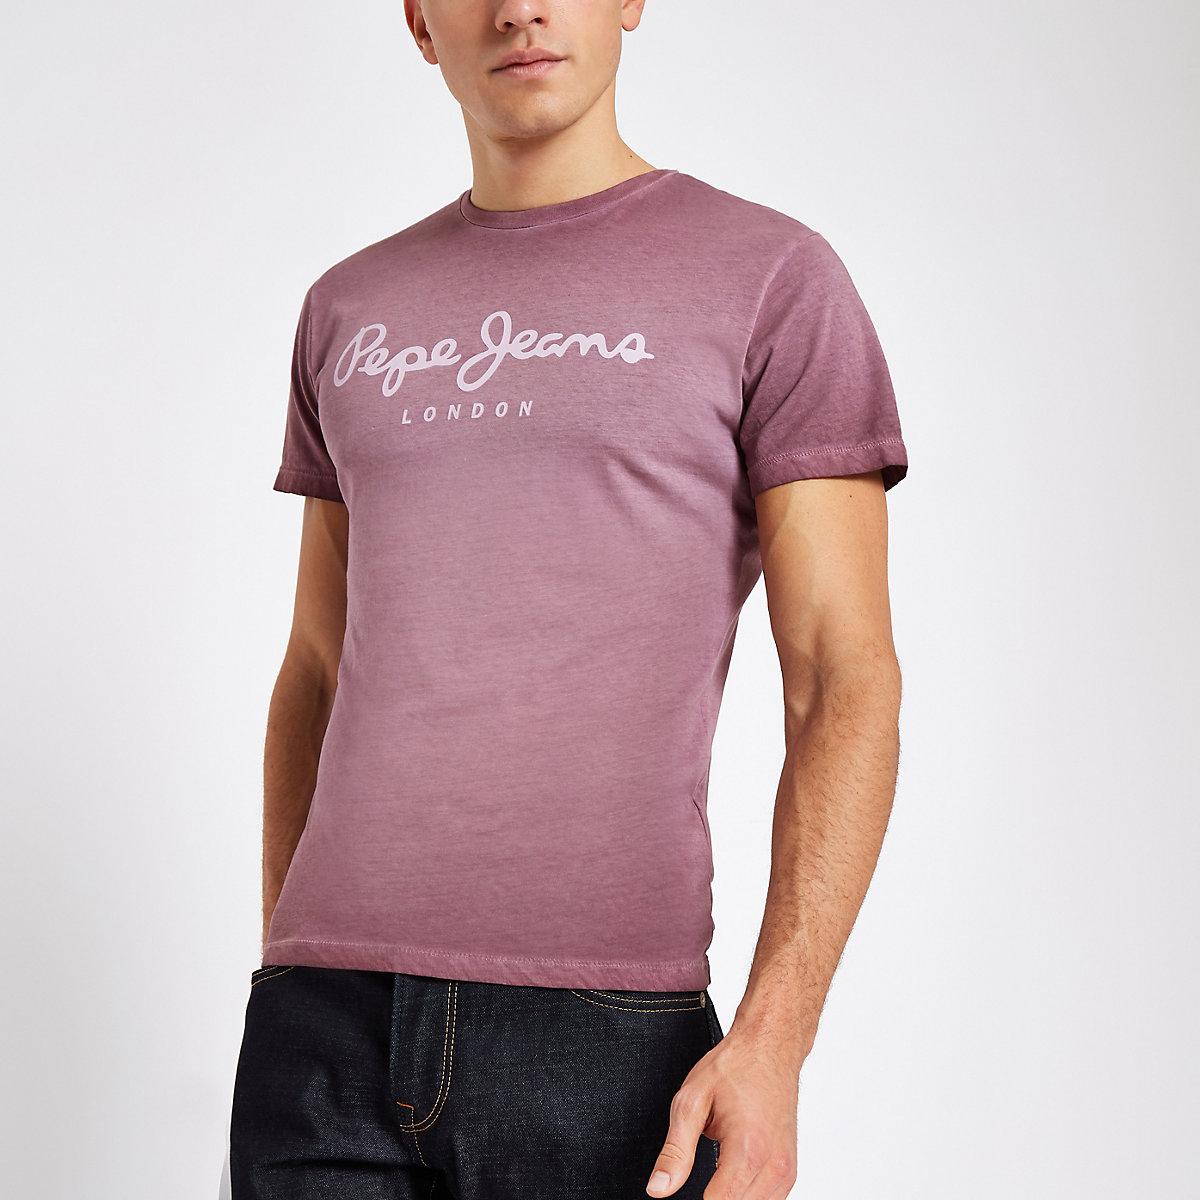 Pepe Jeans burgundy logo T-shirt